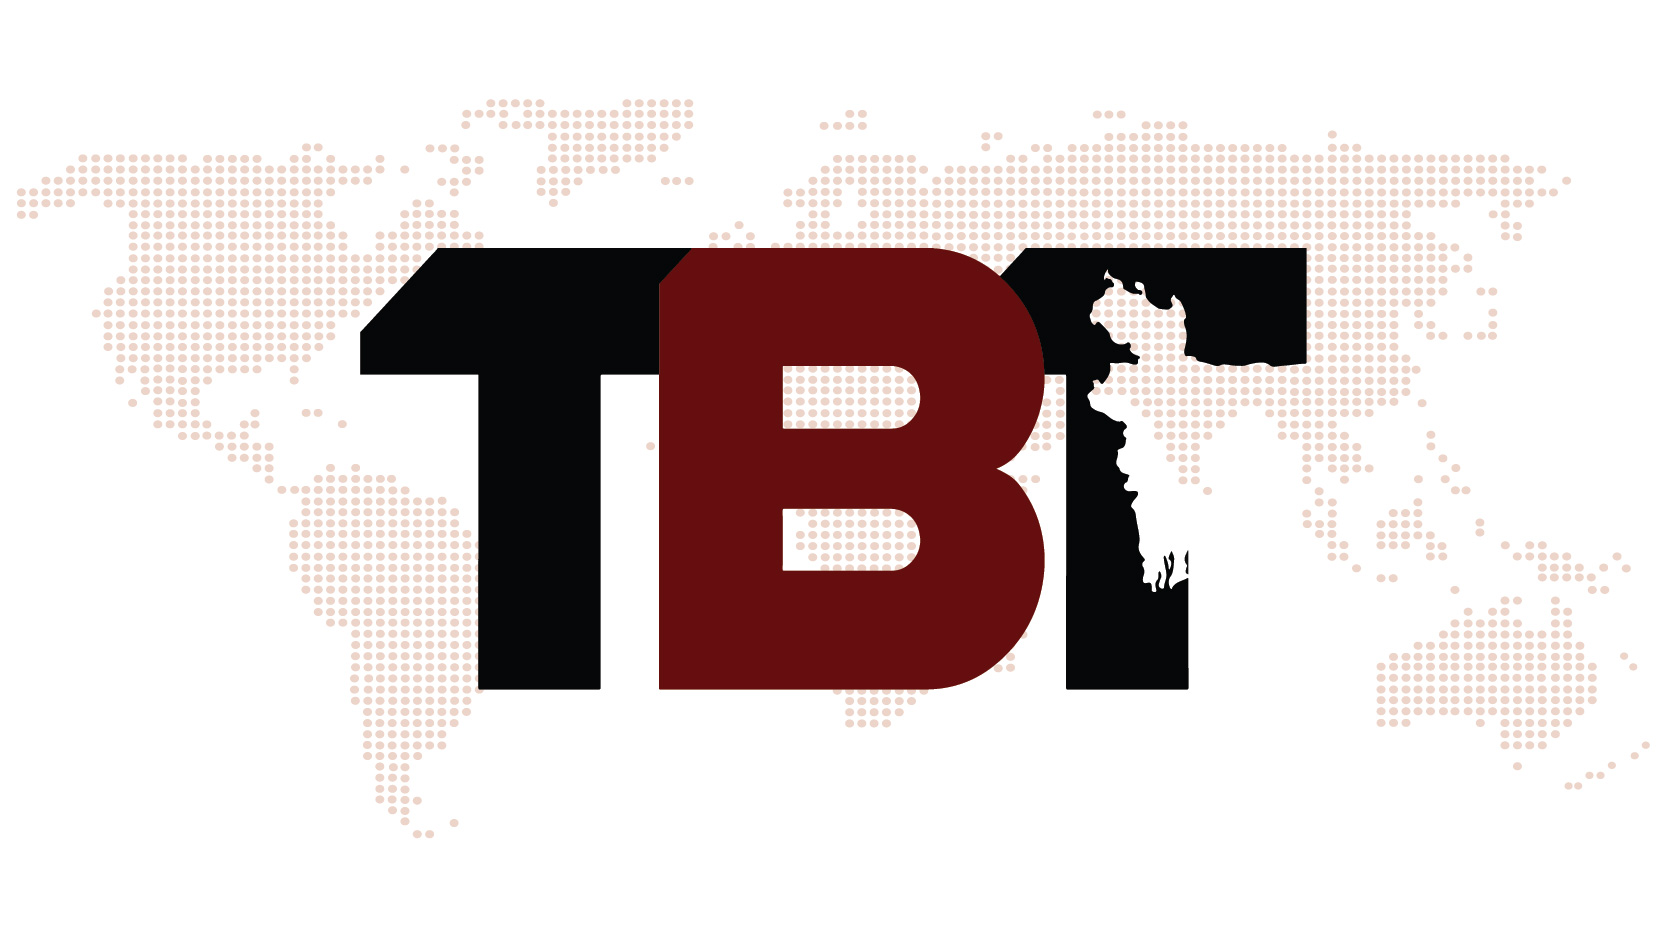 BD receives around 8 lakh doses of AstraZeneca vaccine